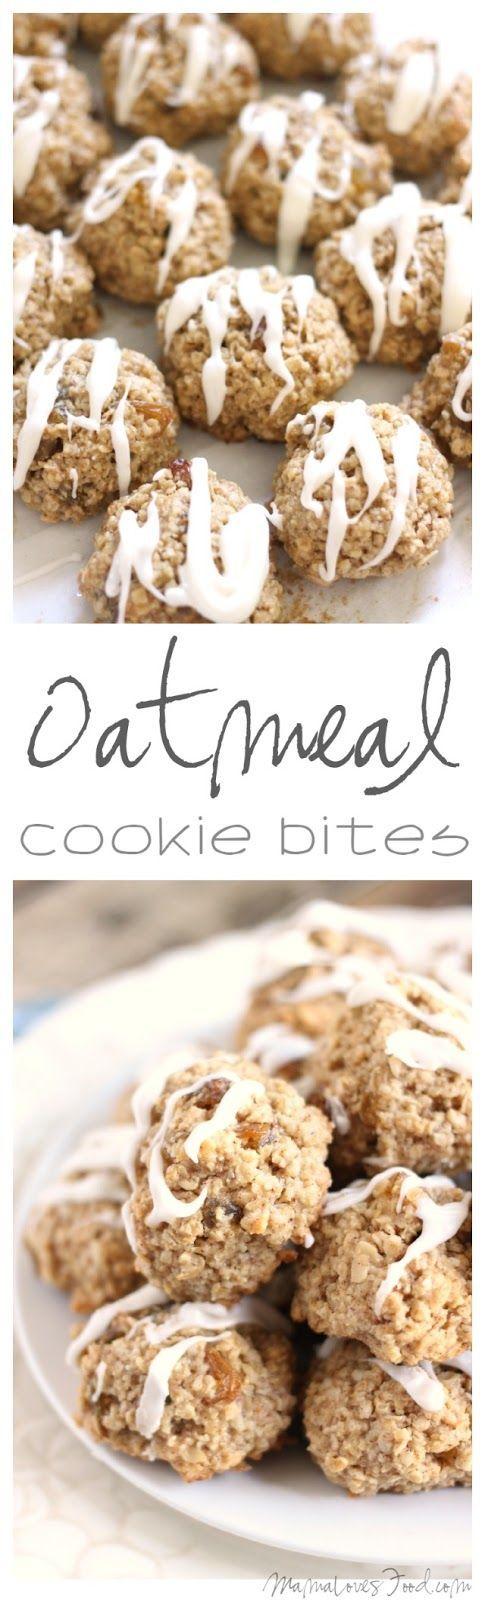 Flourless Oatmeal Cookie Bites #MyLittleRemedies ad @target